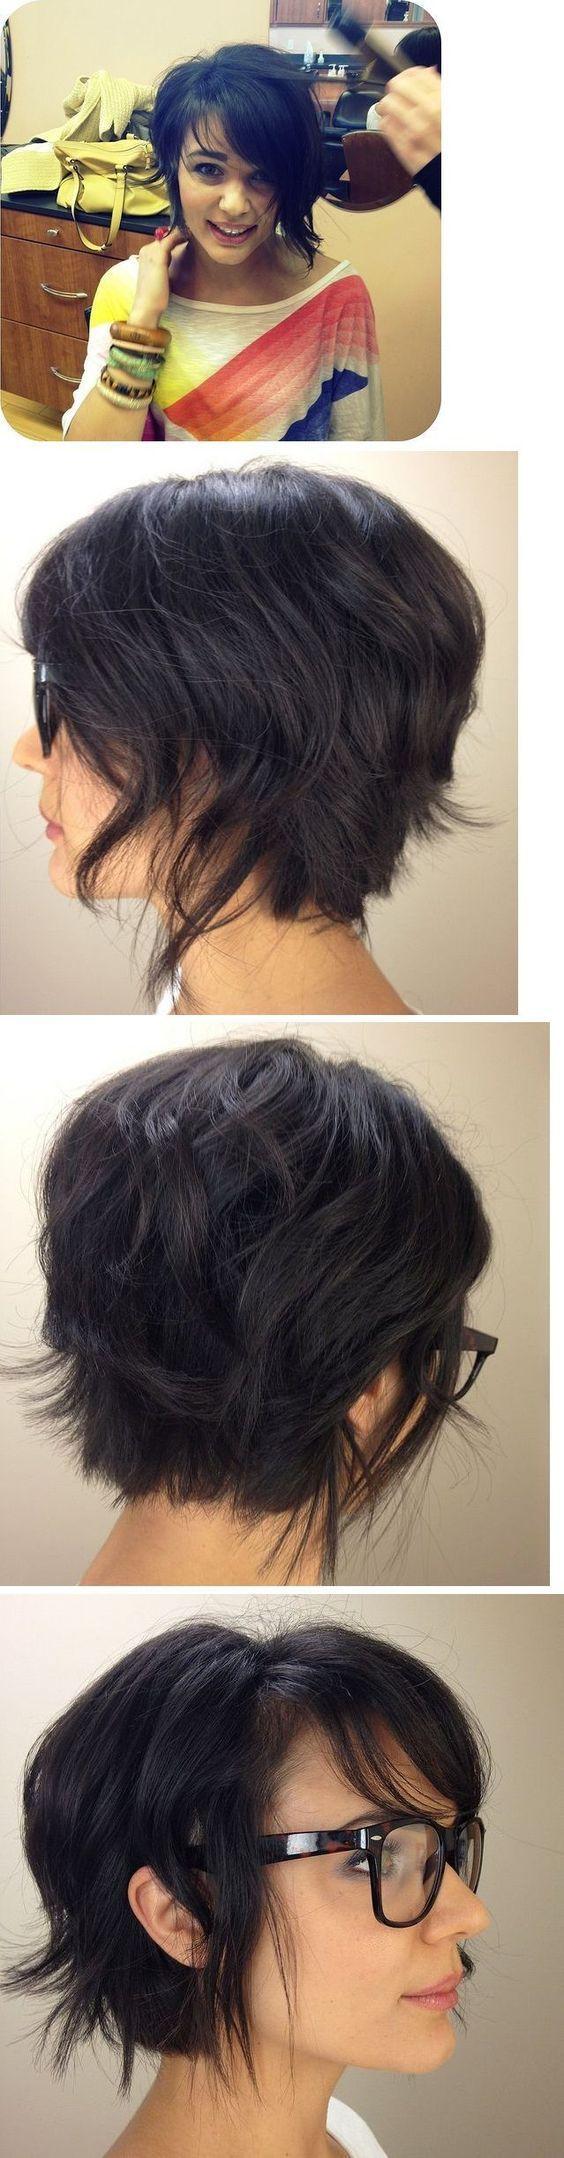 Short Trendy Haircuts